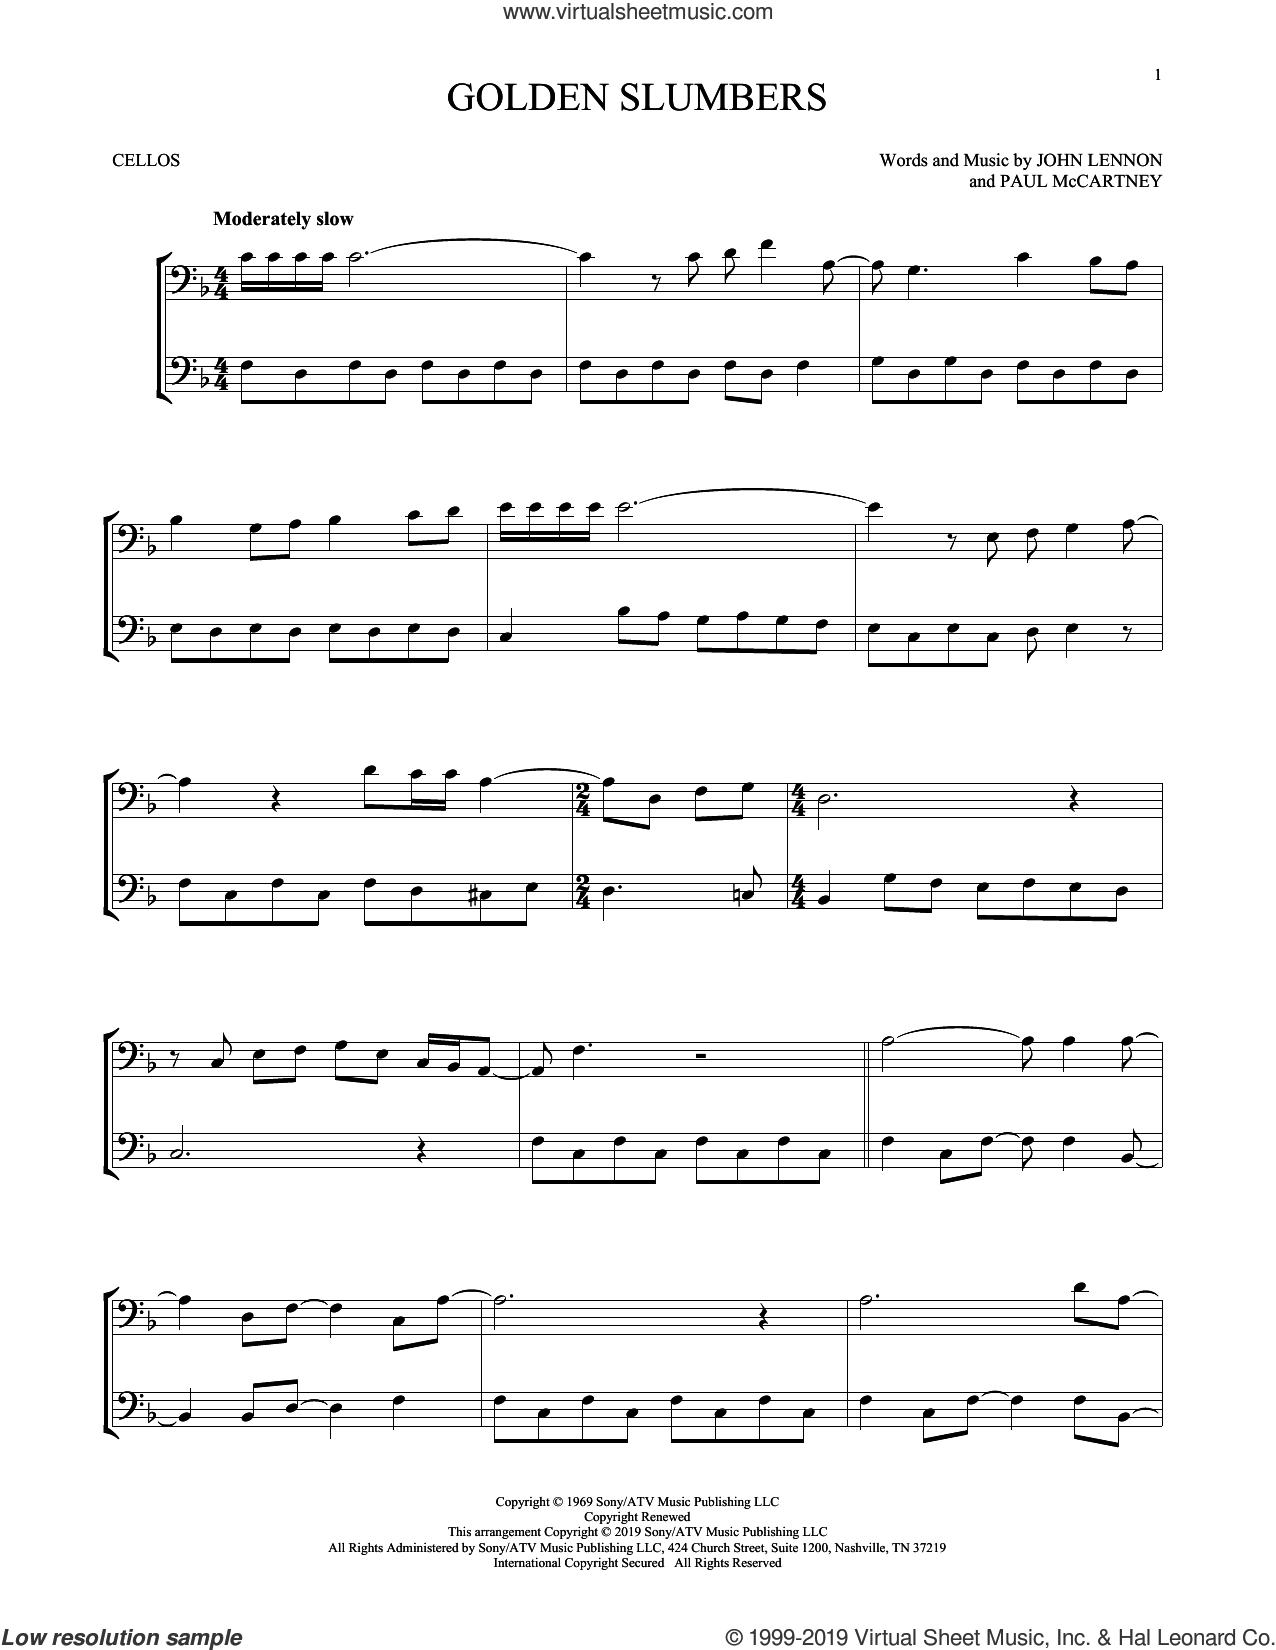 Golden Slumbers sheet music for two cellos (duet, duets) by The Beatles, John Lennon and Paul McCartney, intermediate skill level